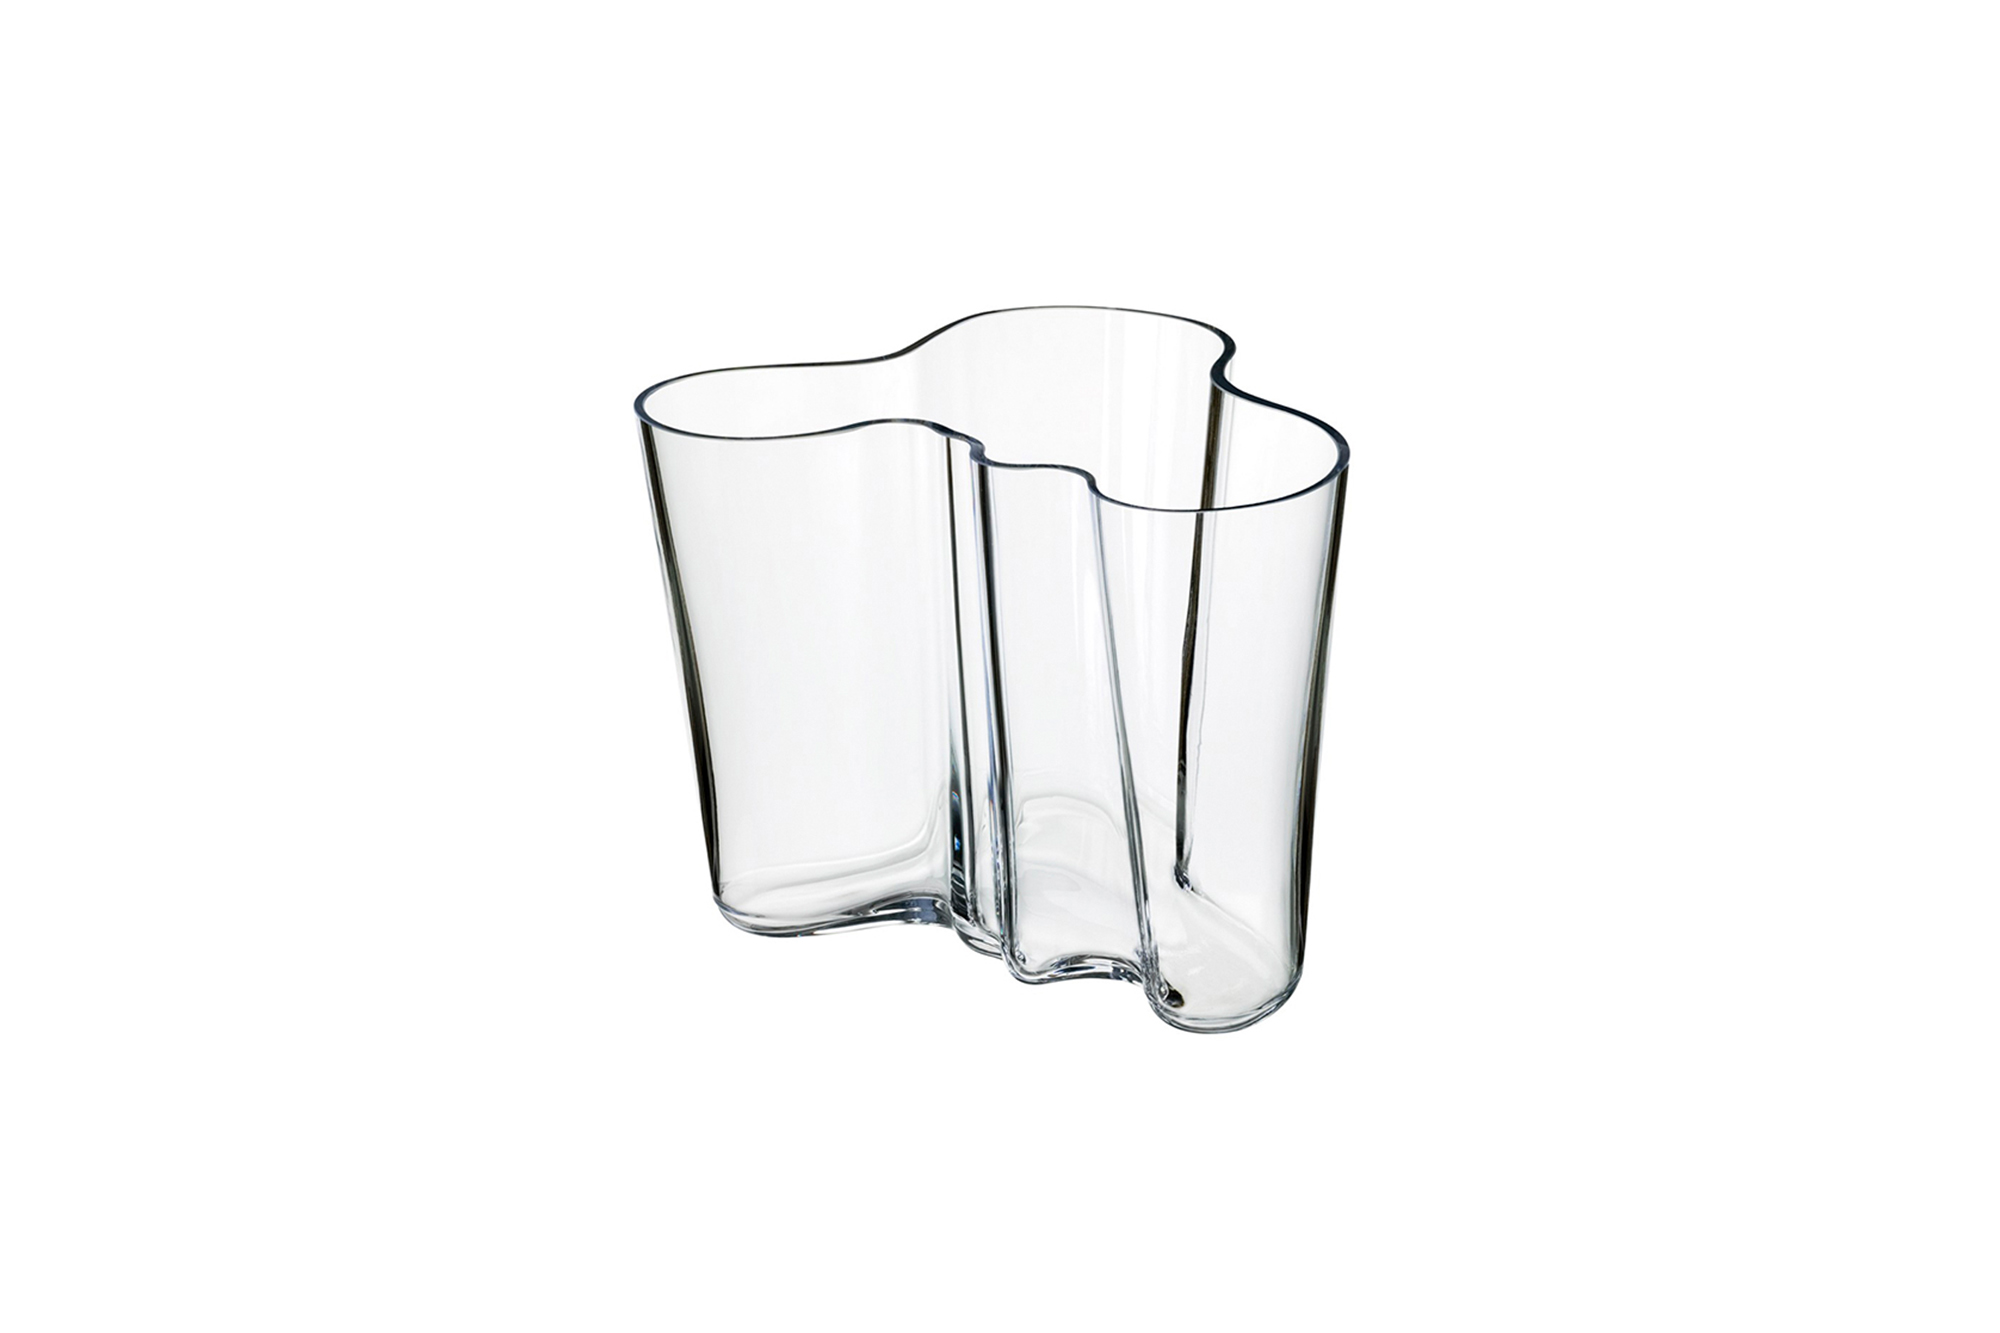 Alvar Aalto Savoy Low Vase